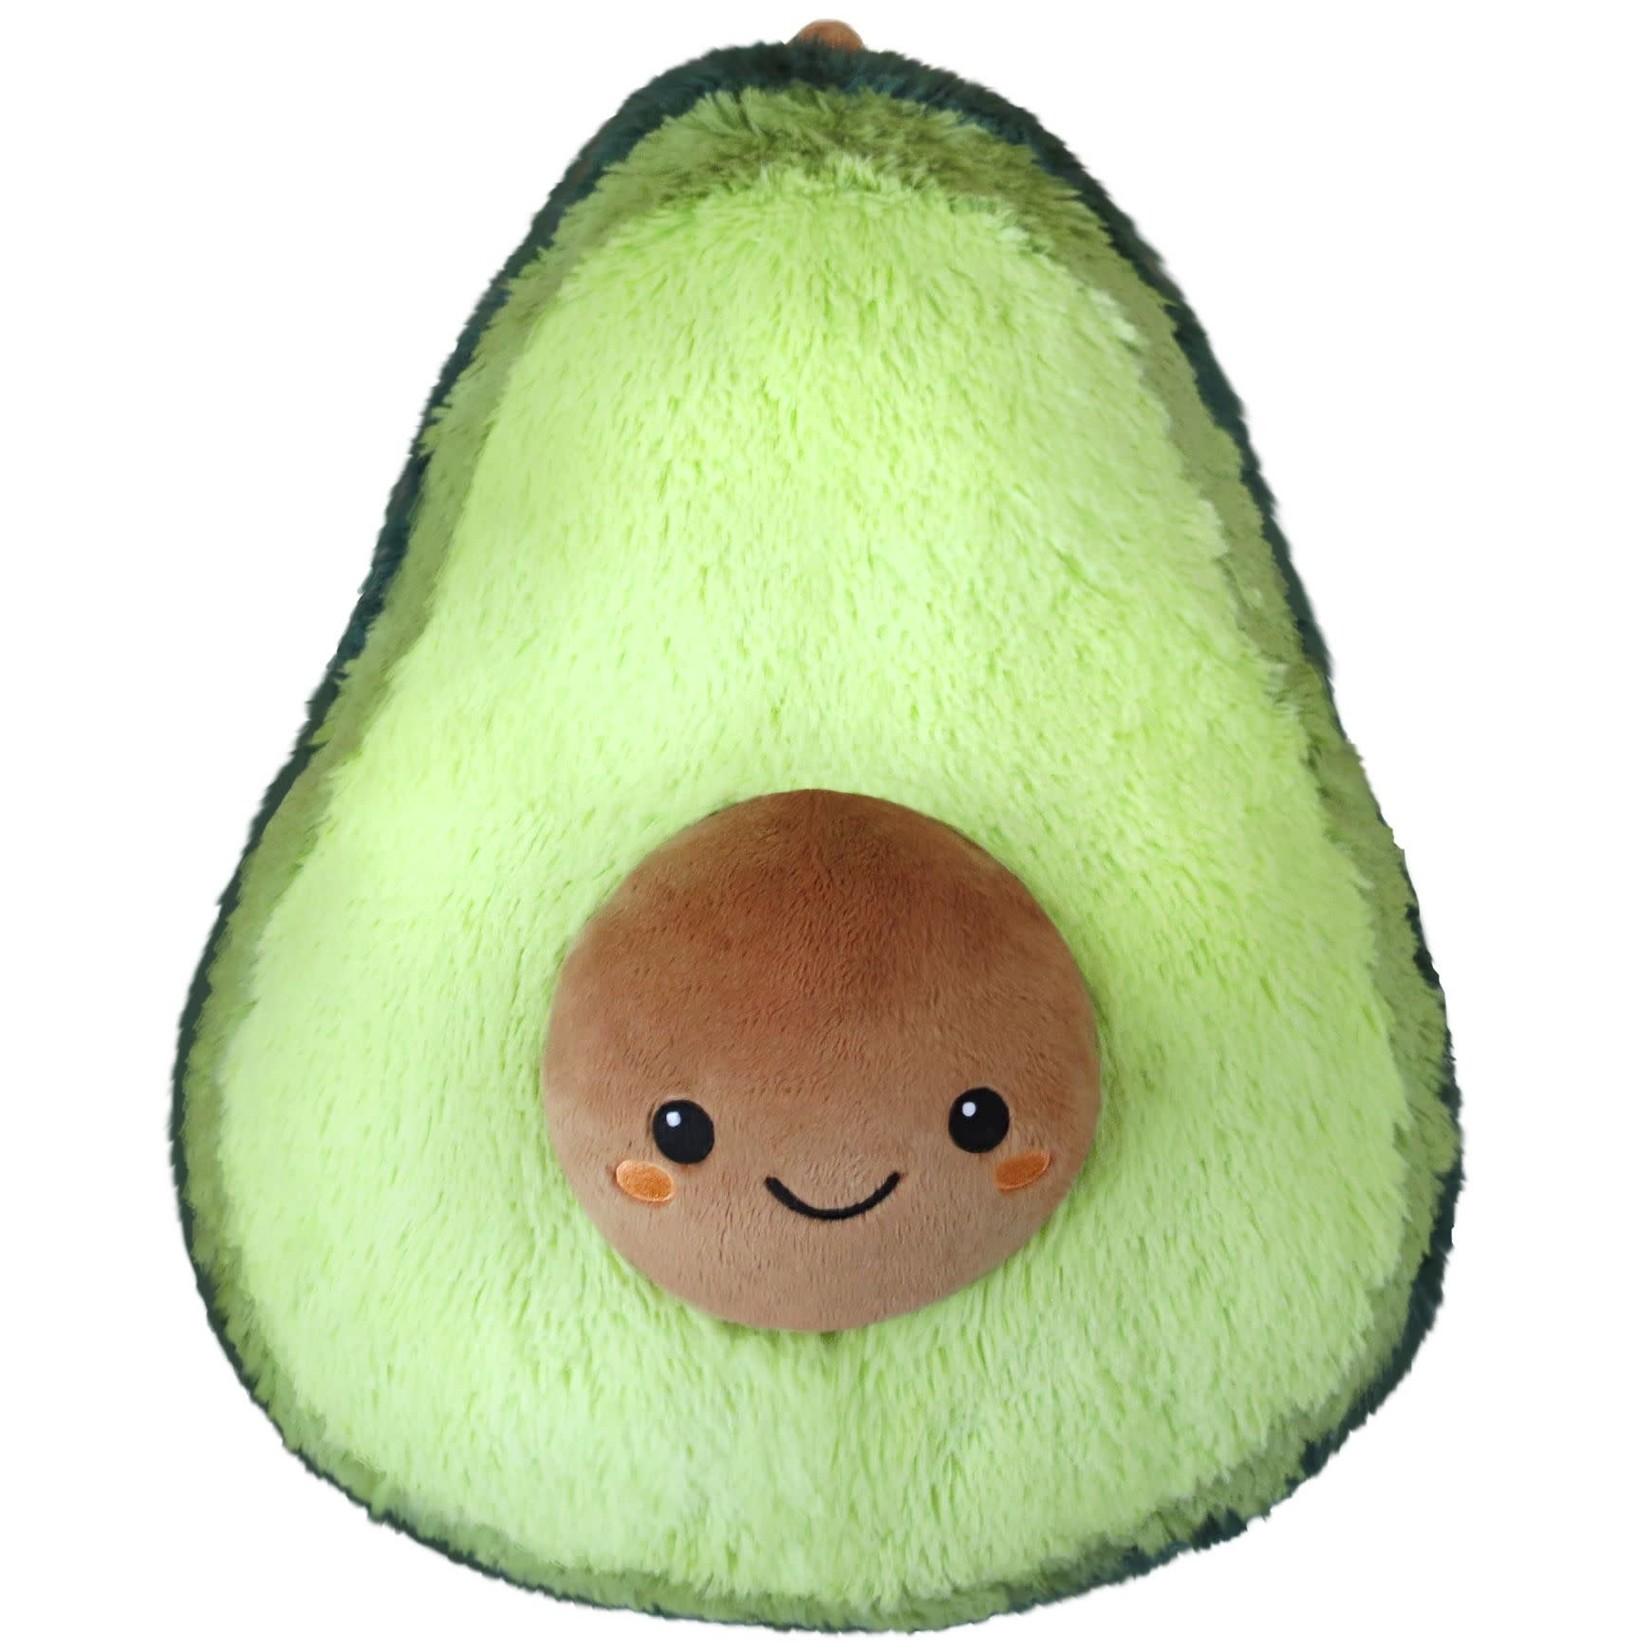 Avocado - Comfort Food